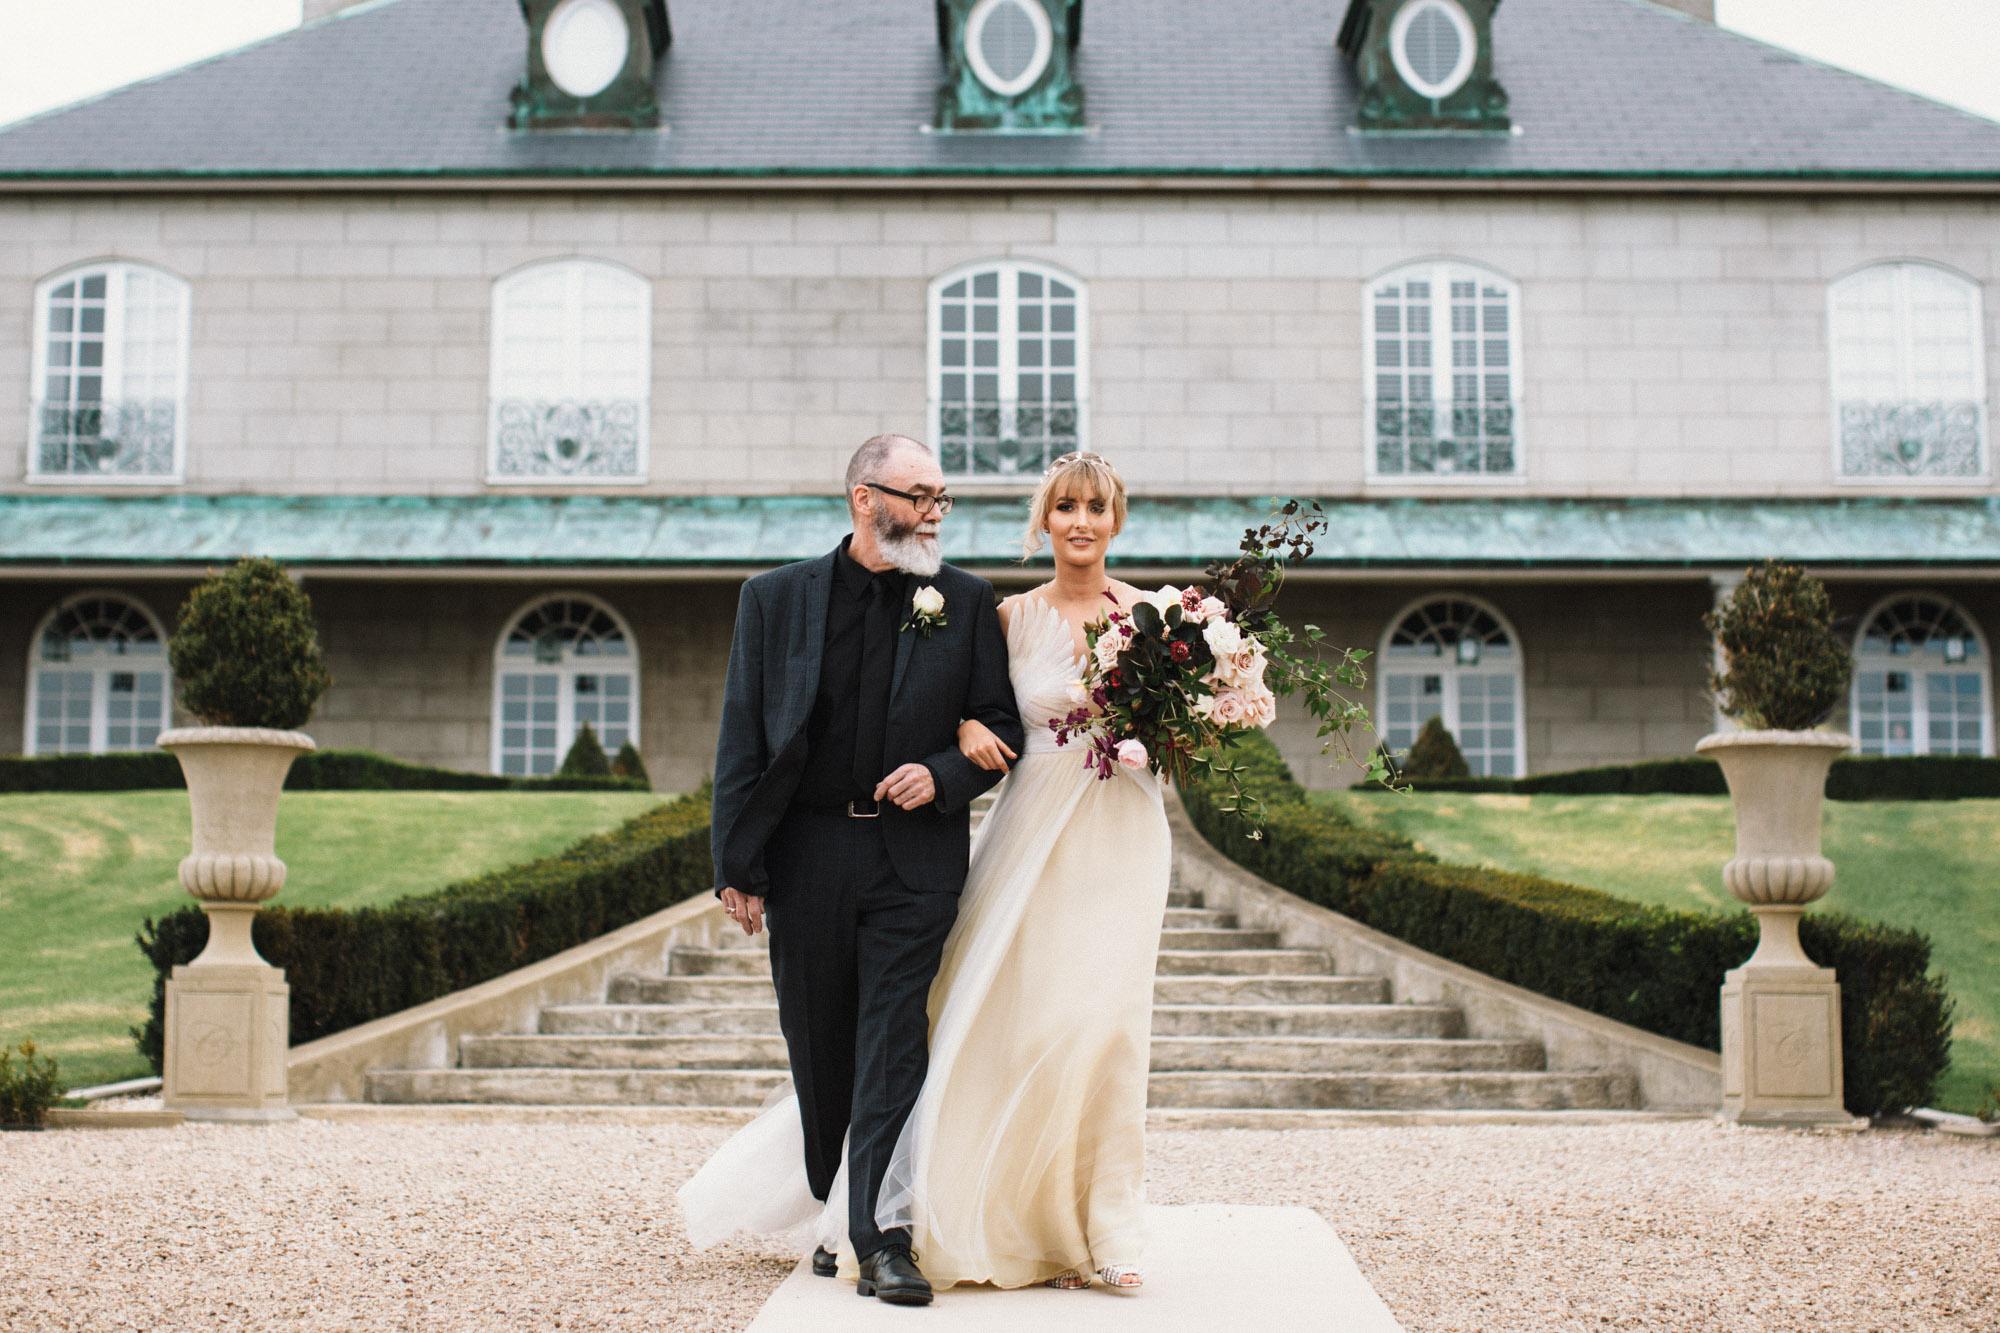 Campbell Point House Wedding HJ + Dean Raphael Weddings-73.jpg